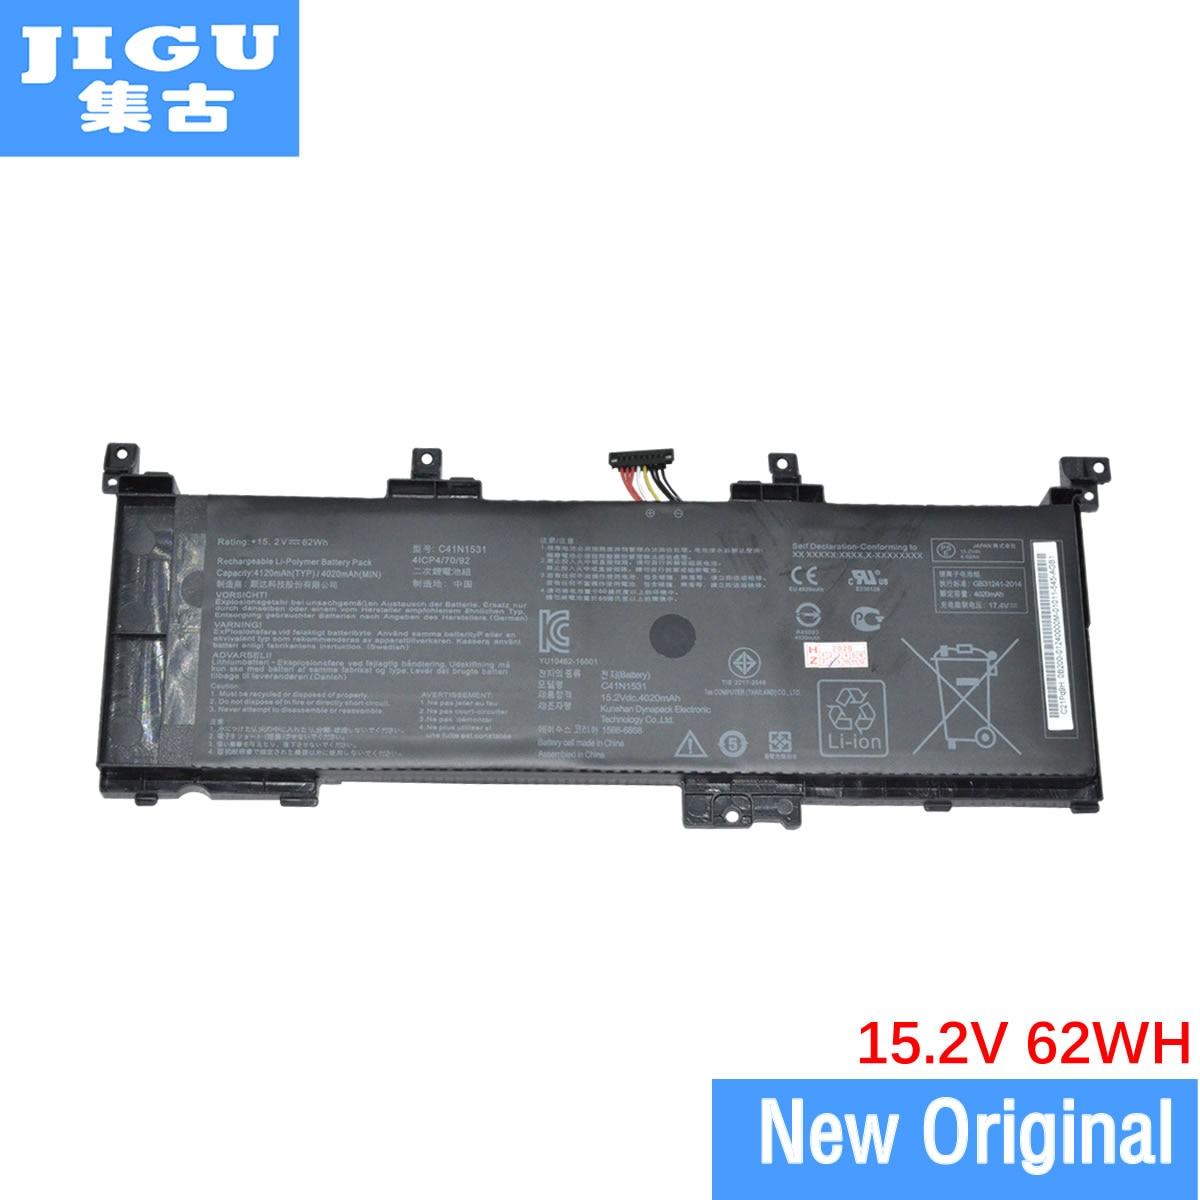 JIGU 0B200-01940100 C41N1531 الأصلي بطارية كمبيوتر محمول ل Asus FX502VS G502VS GL502VSK GL502VY GL502VS-GZ132T GL502VS-GZ217T